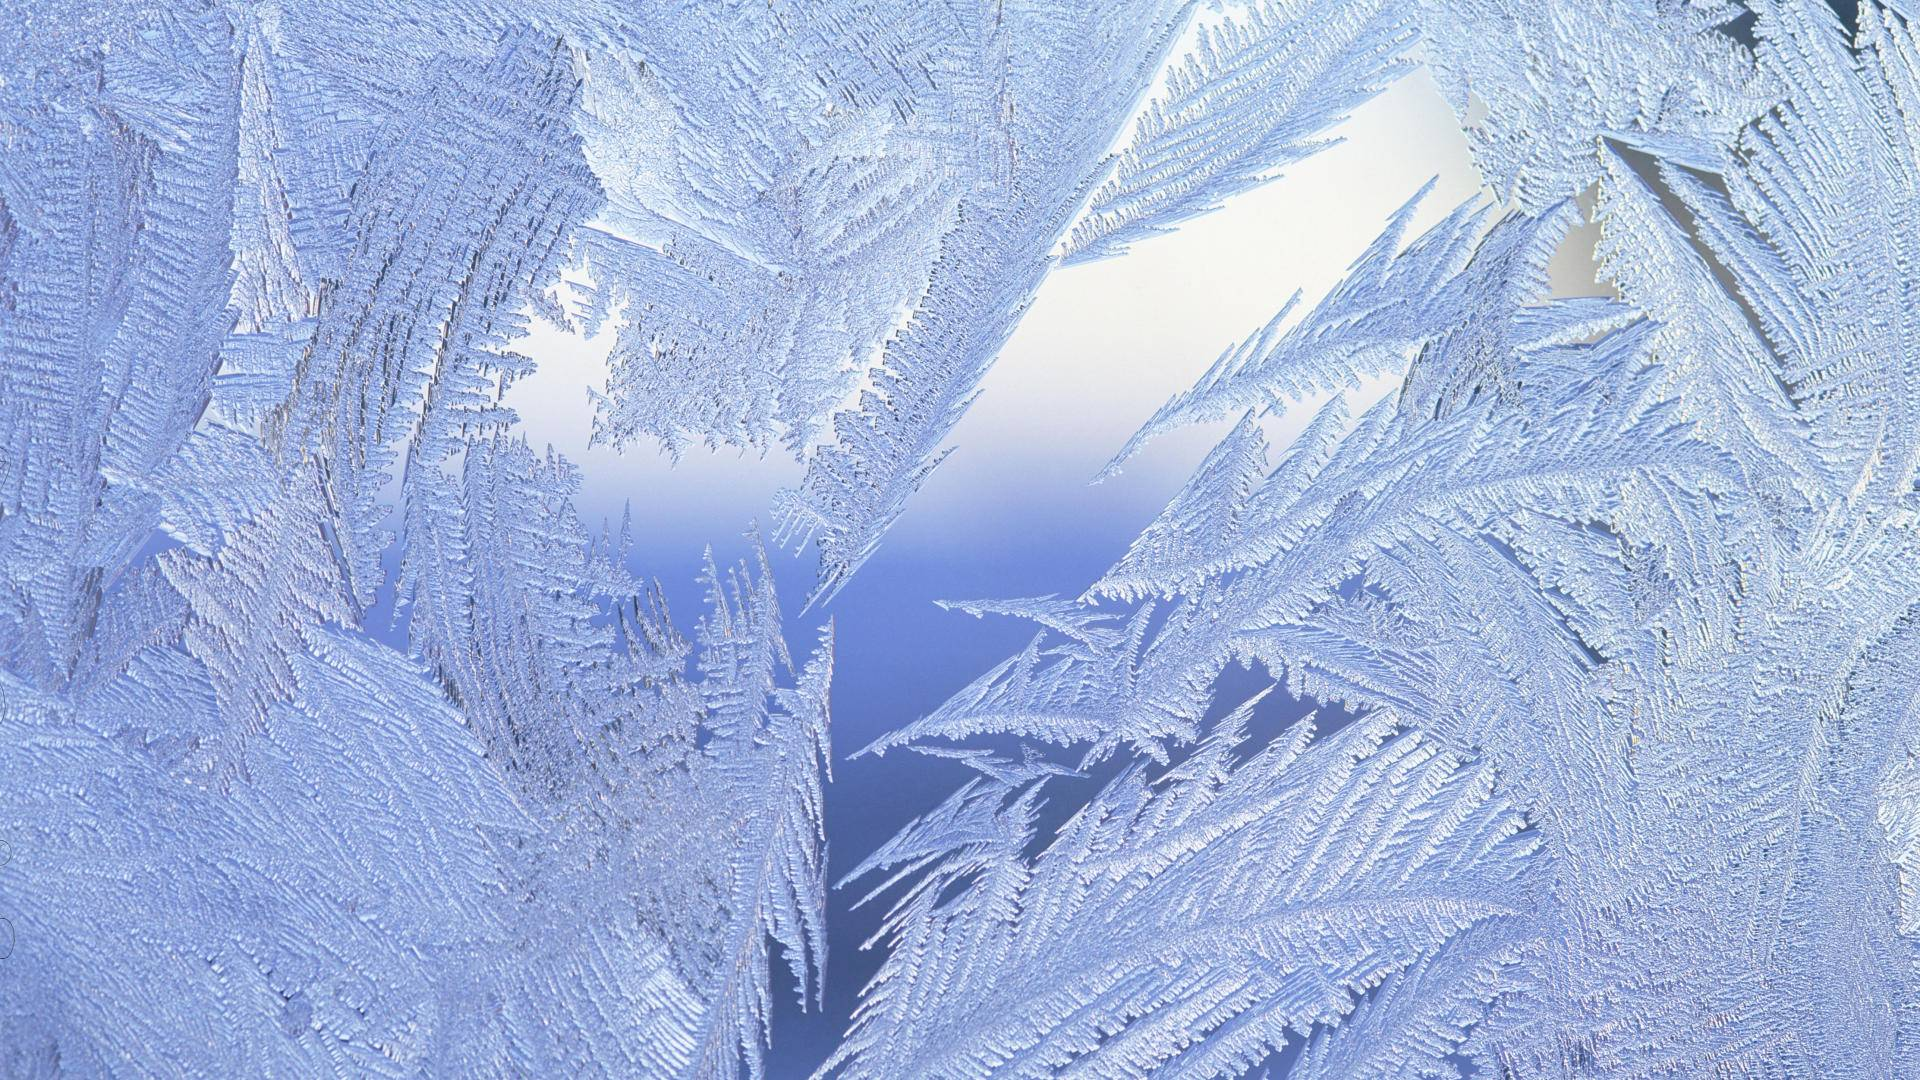 зима, поверхность, мороз